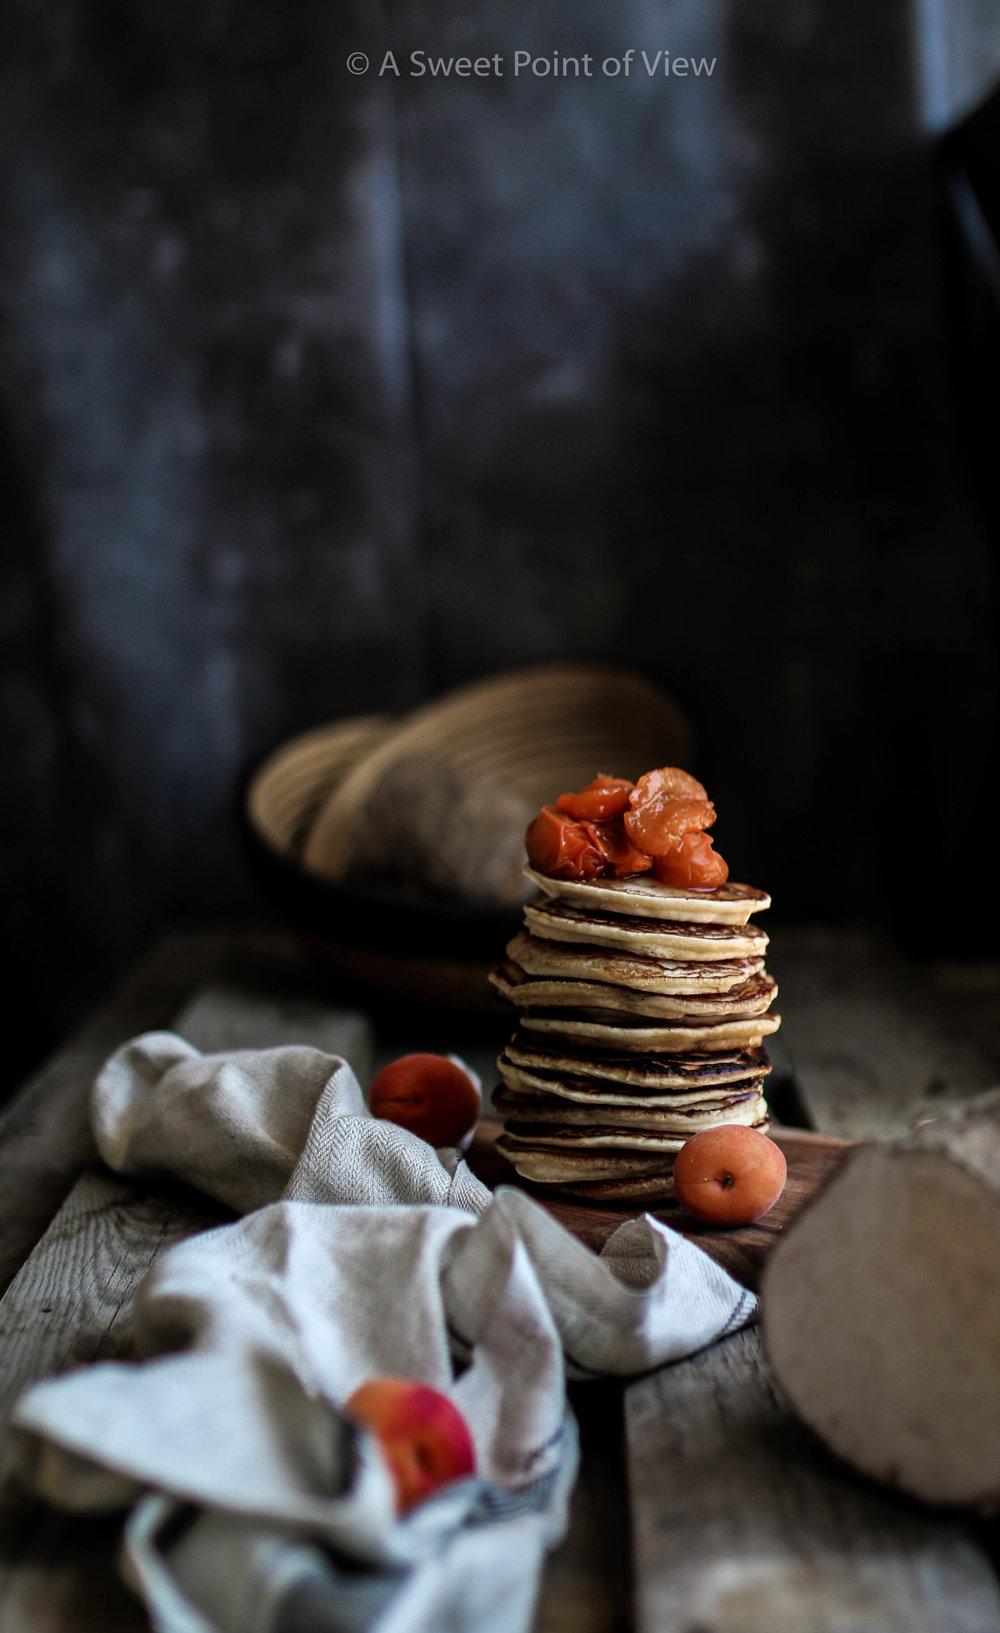 Copy of Yam-Flour-Pancakes-Homemade-Apricot-Yam-8-of-1.jpg